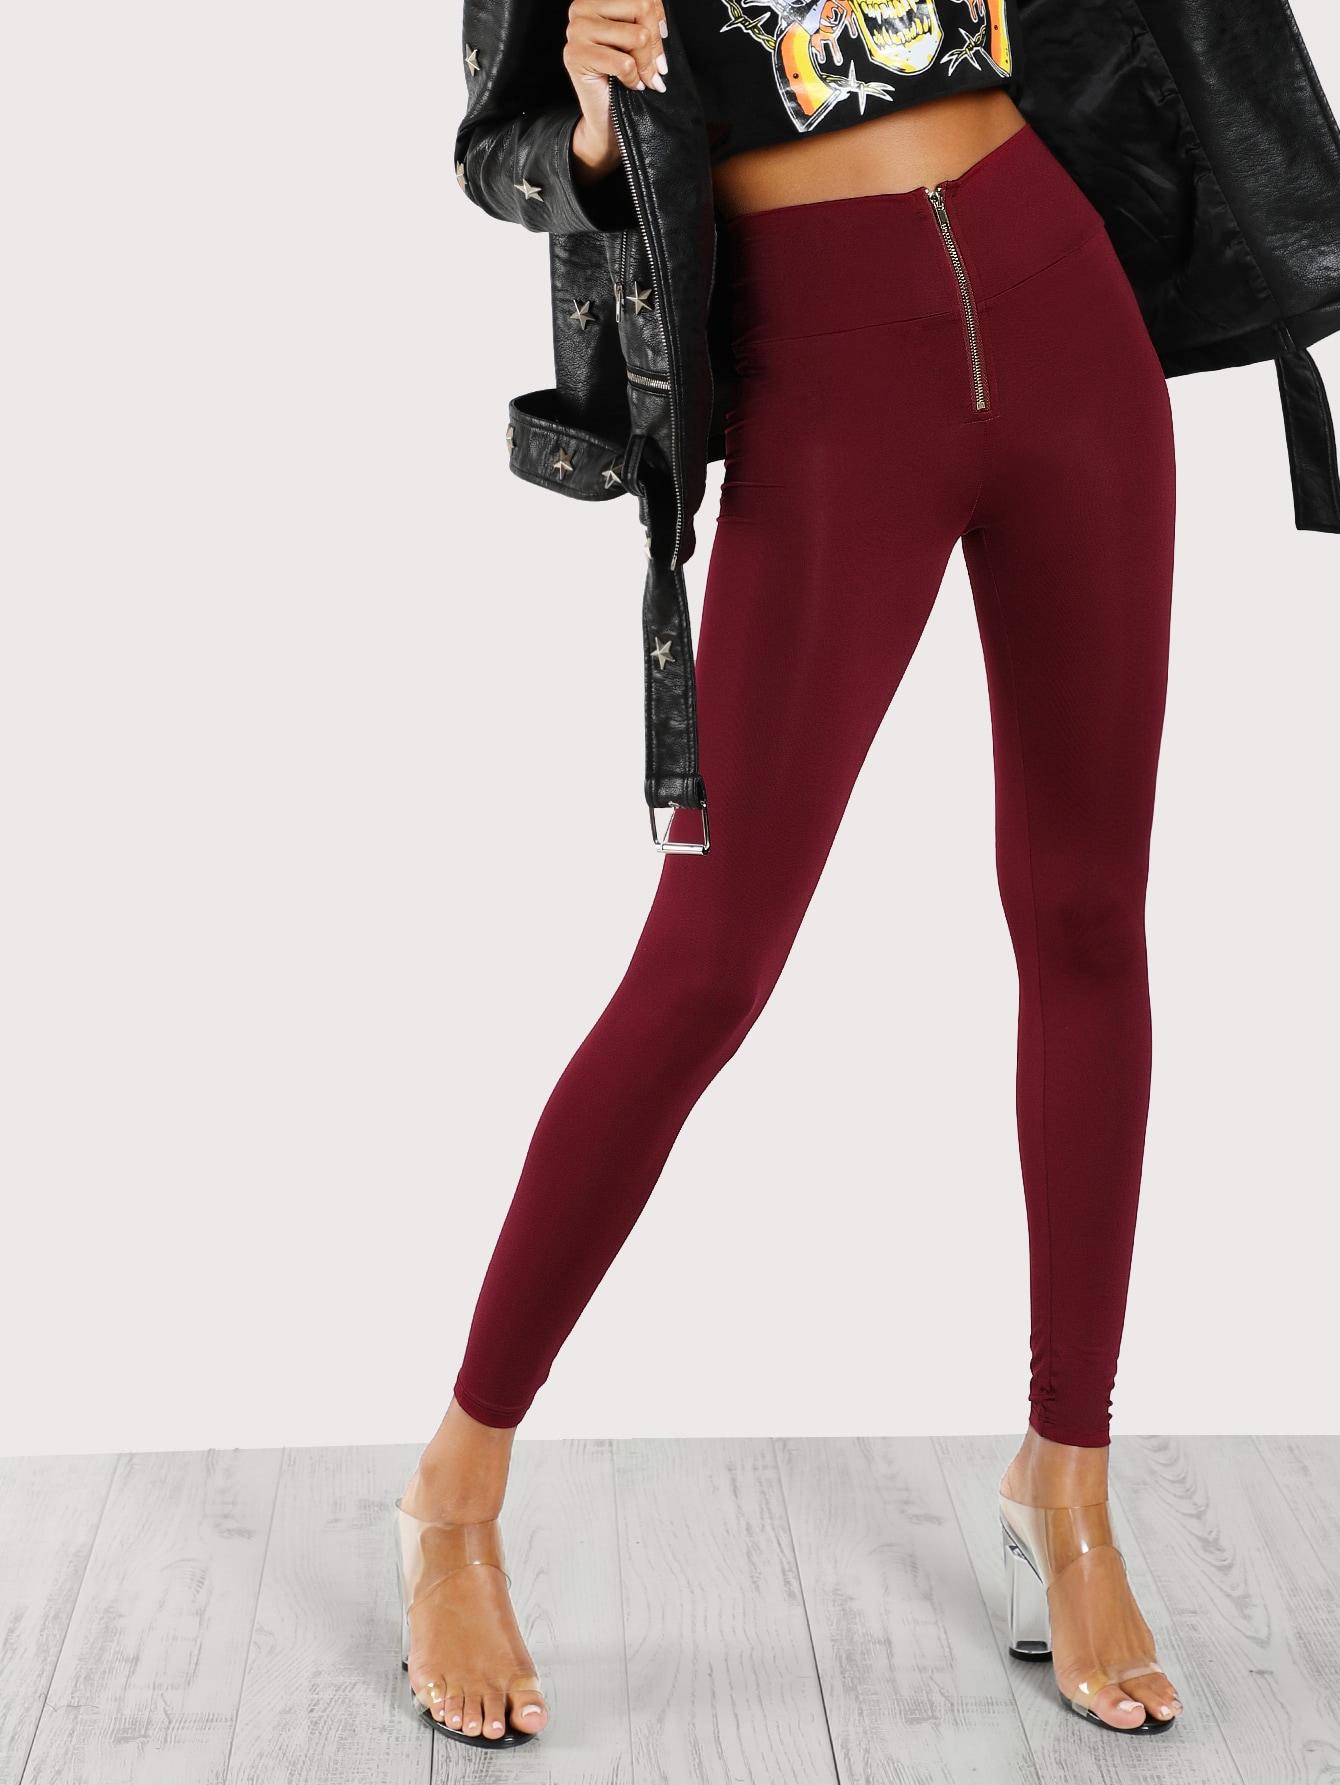 High Waisted Zip Front Leggings